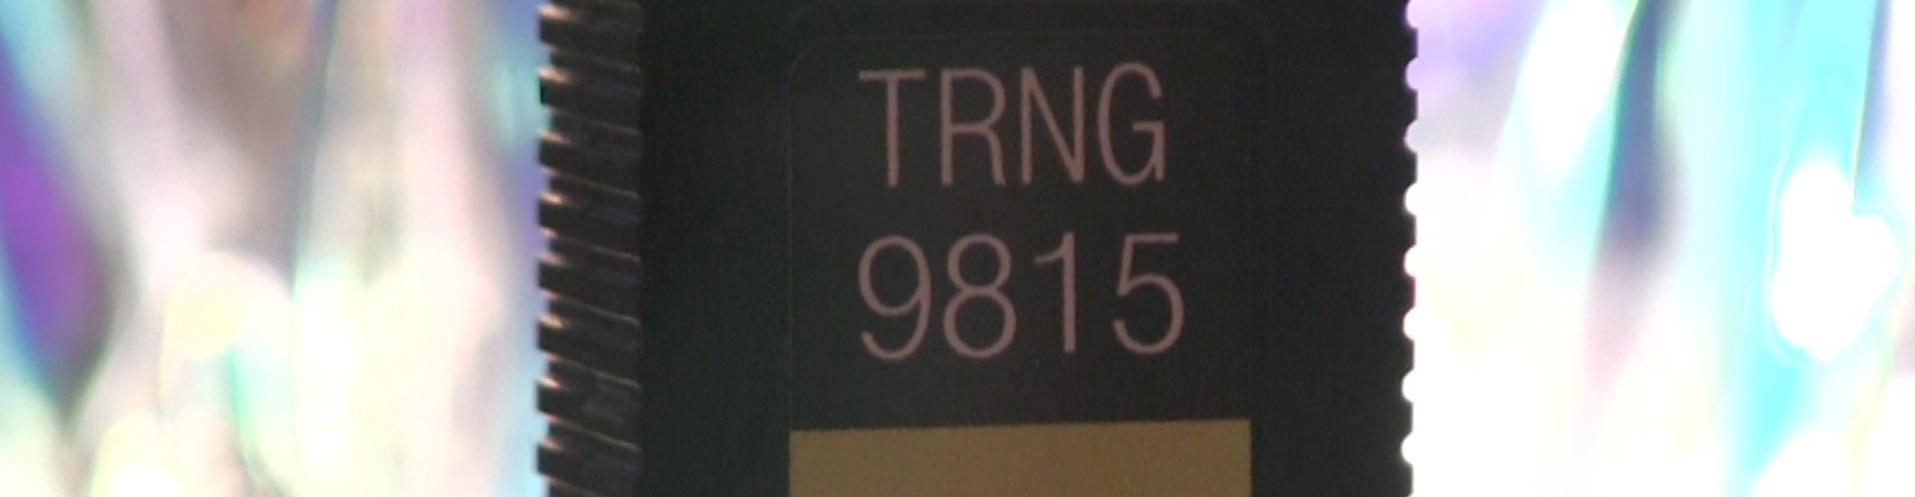 TRNG9815